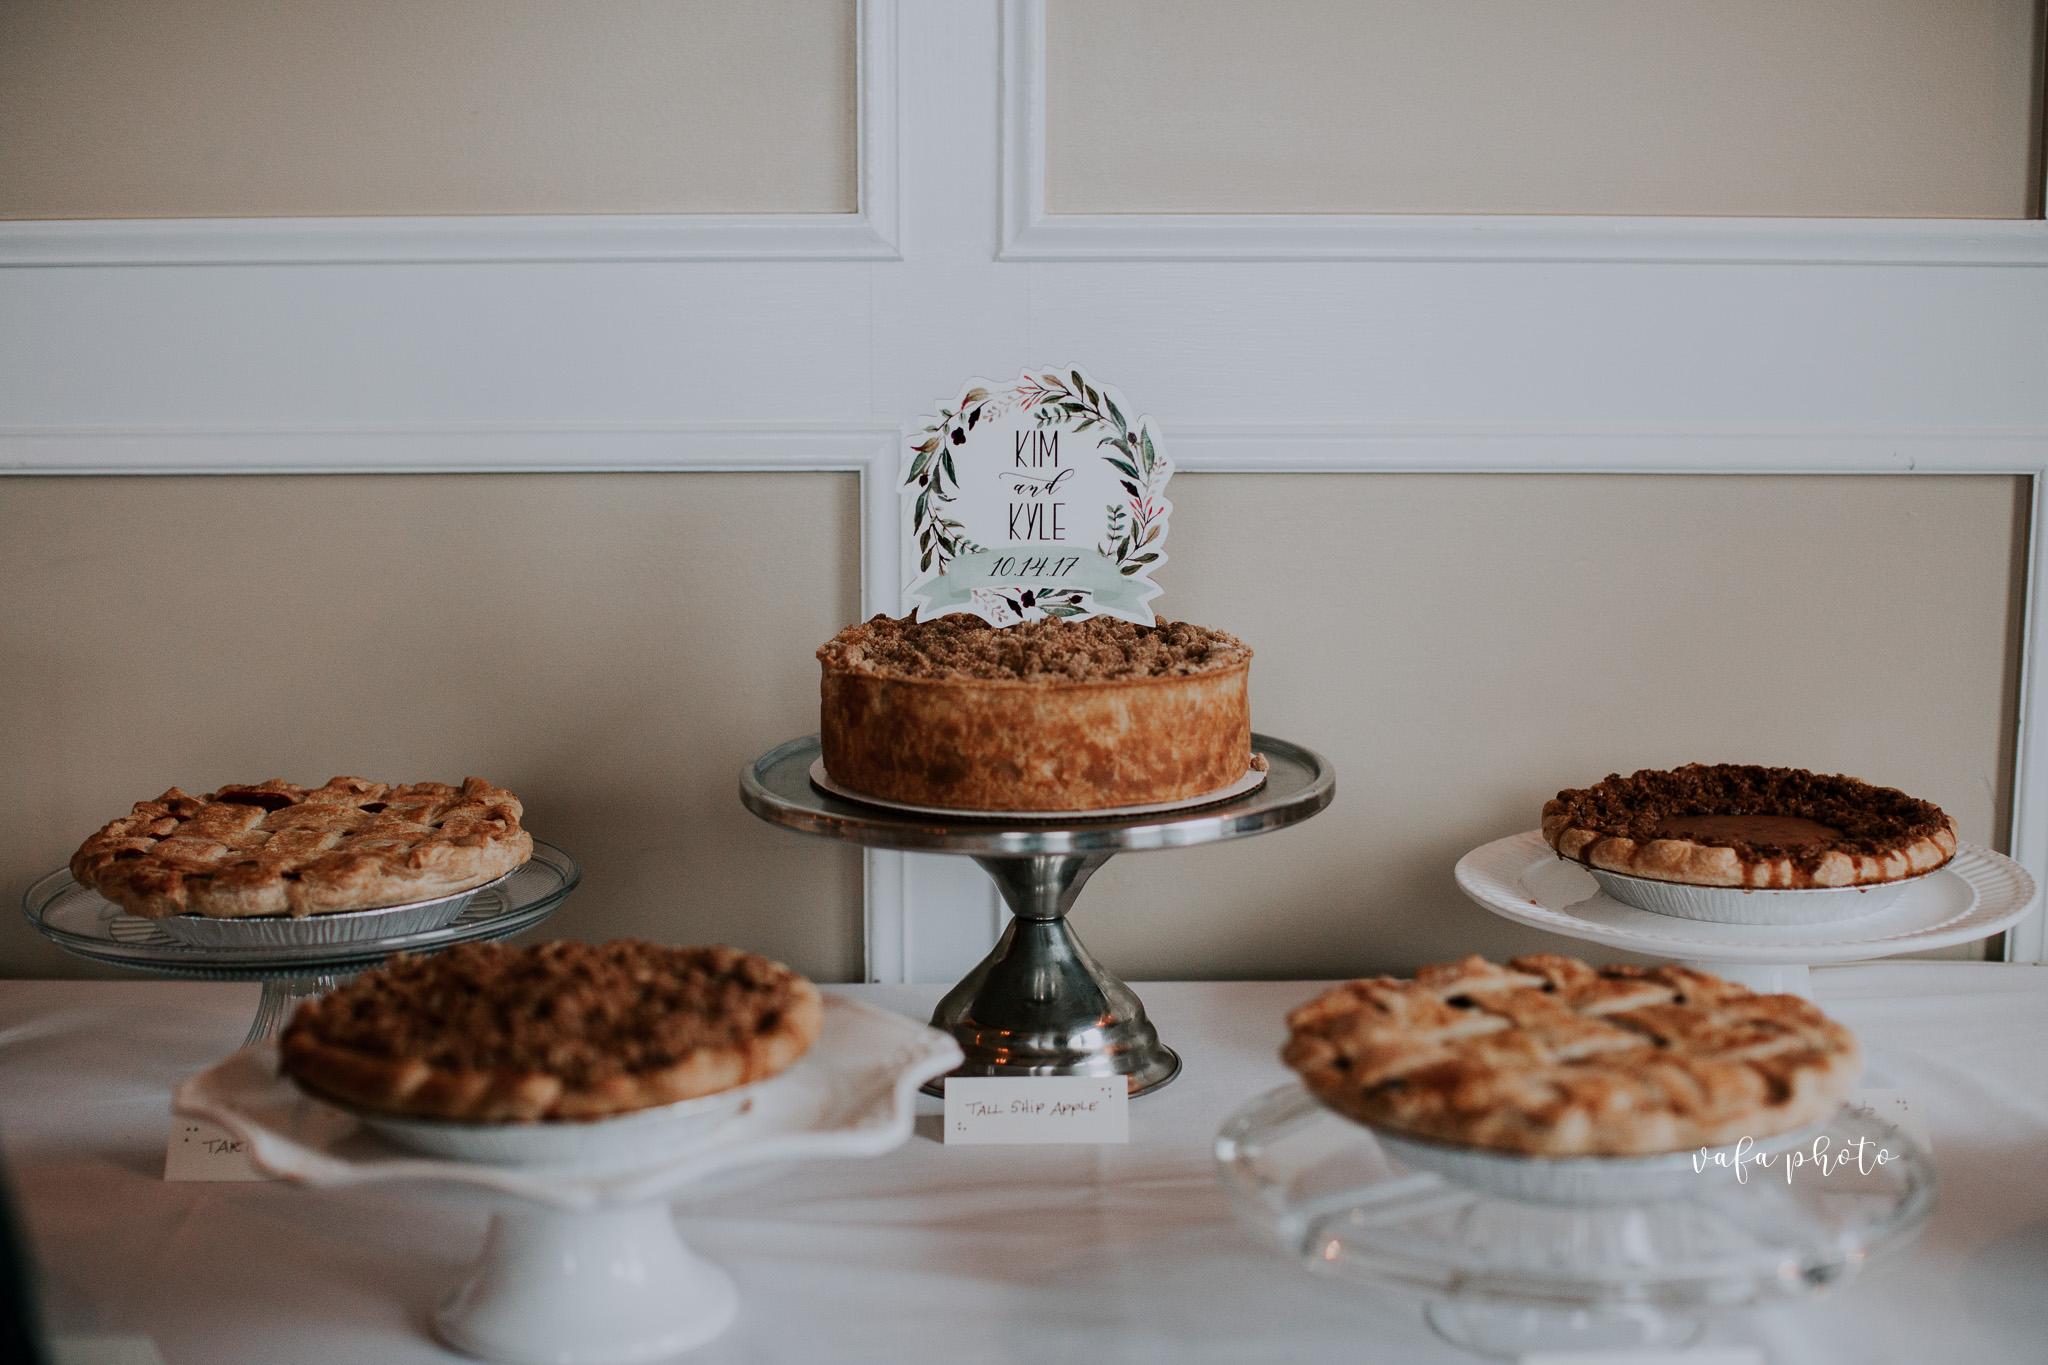 Little-Presque-Isle-Michigan-Wedding-Kim-Kyle-Vafa-Photo-640.jpg